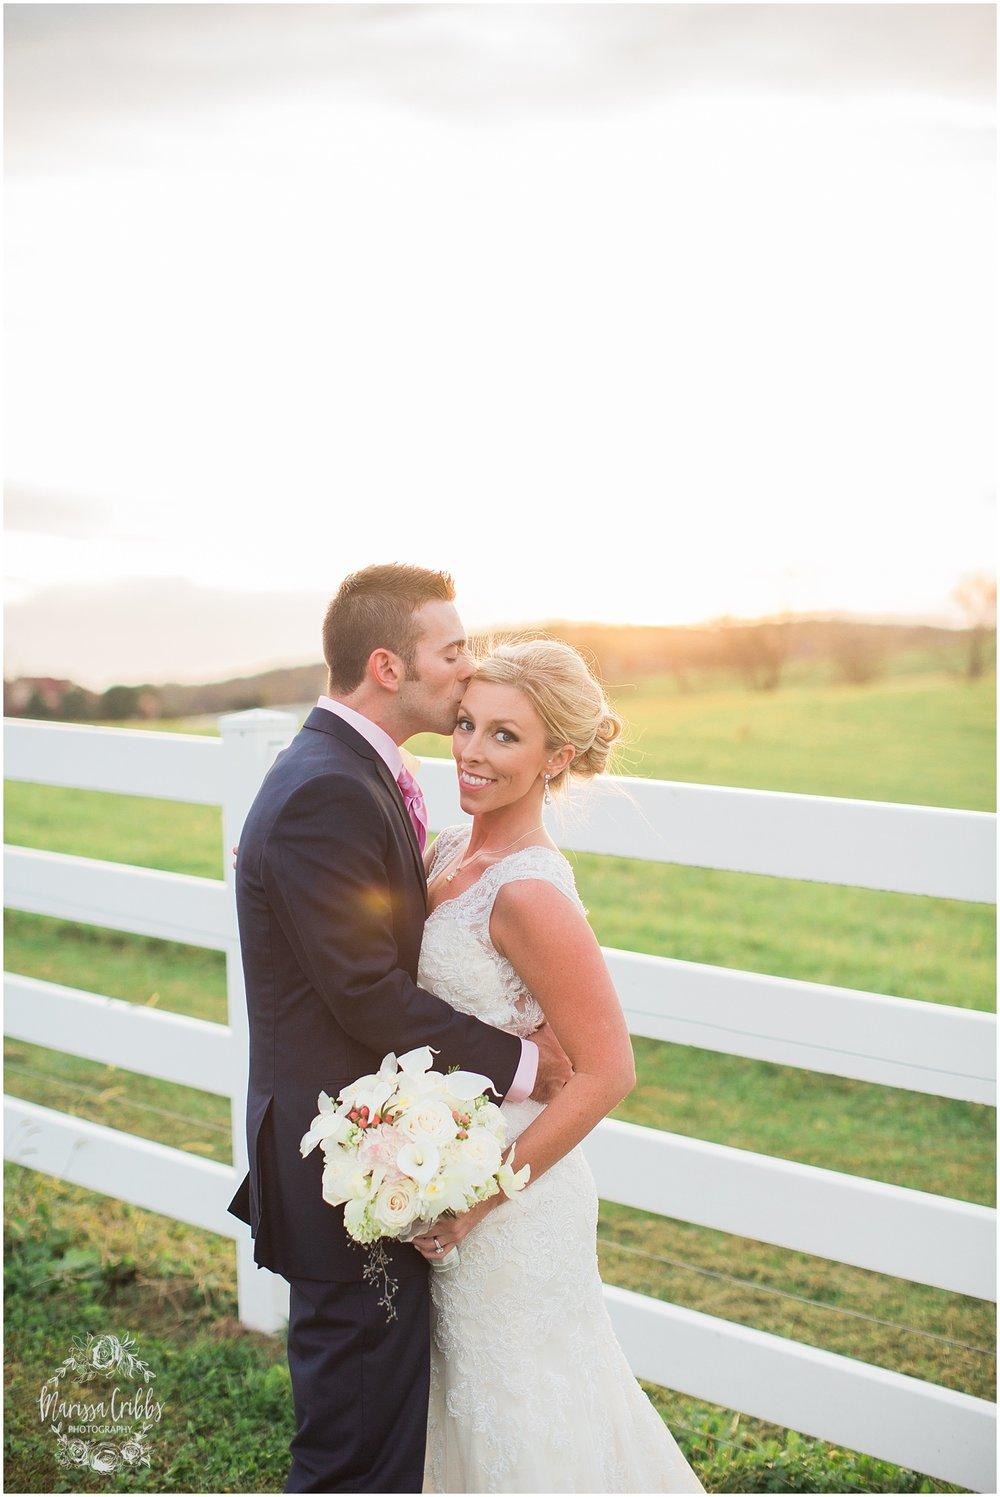 Alex+&+Amie+_+Eighteen+Ninety+Event+Space+_+Marissa+Cribbs+Photography+_+Kansas+City+Perfect+Wedding+Guide_1361.jpg